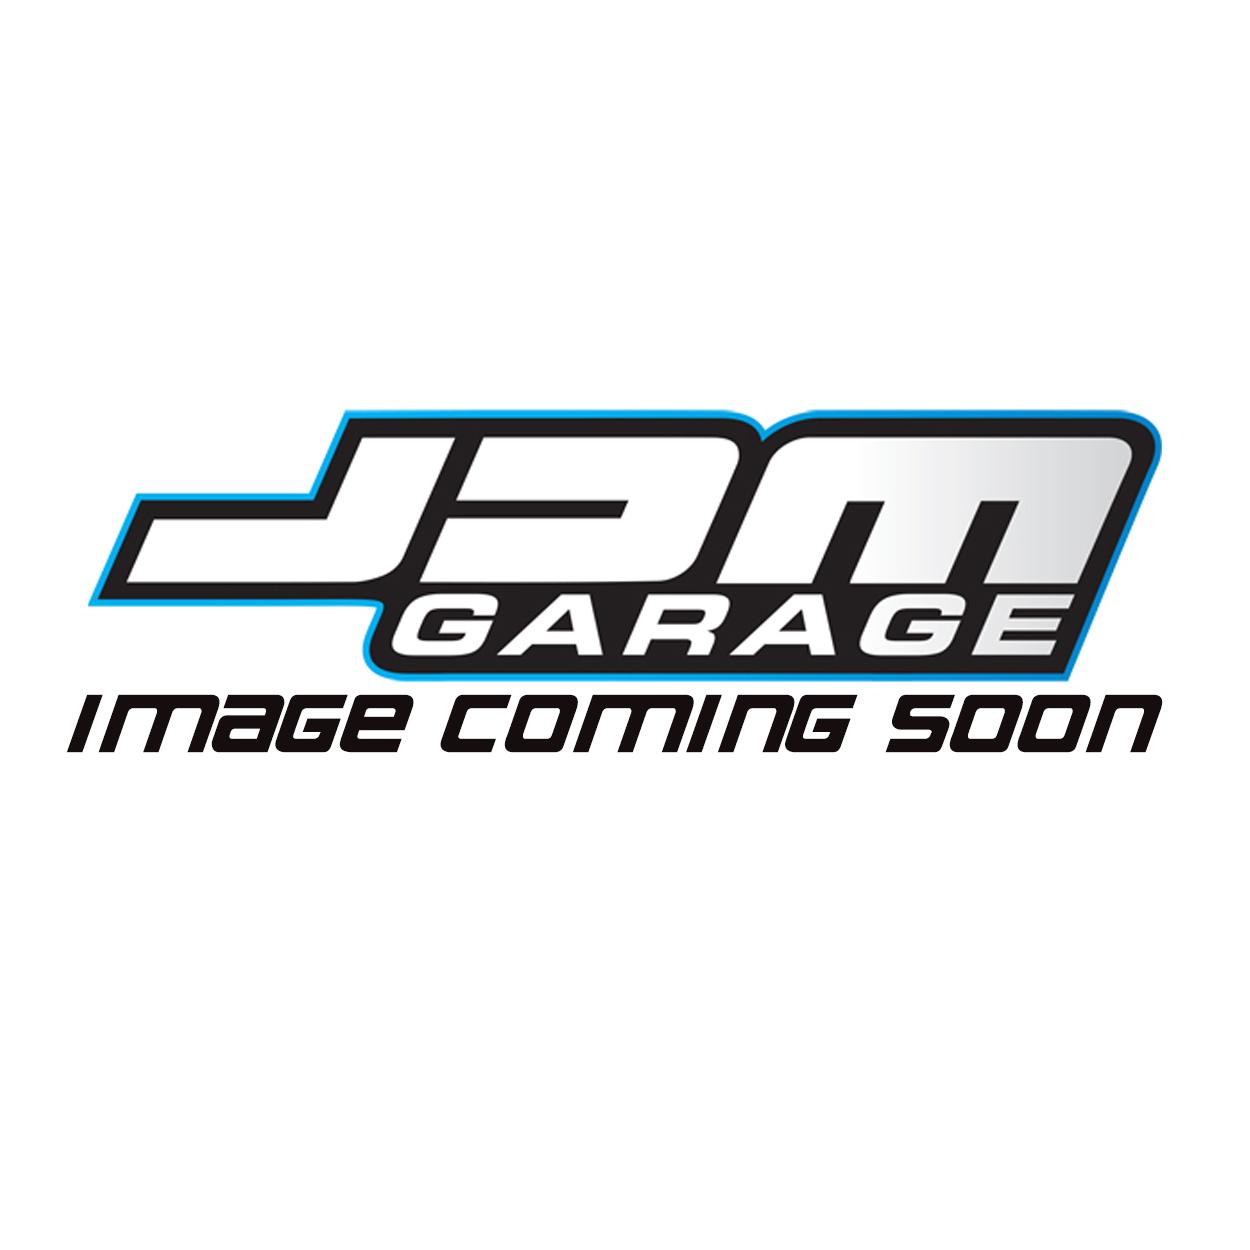 Genuine Radiator Lower Insulator Bush For Silvia S13 S14 S15 CA18DET SR20DET / Laurel C33 Cefiro A31 RB20DET 21508-10v00